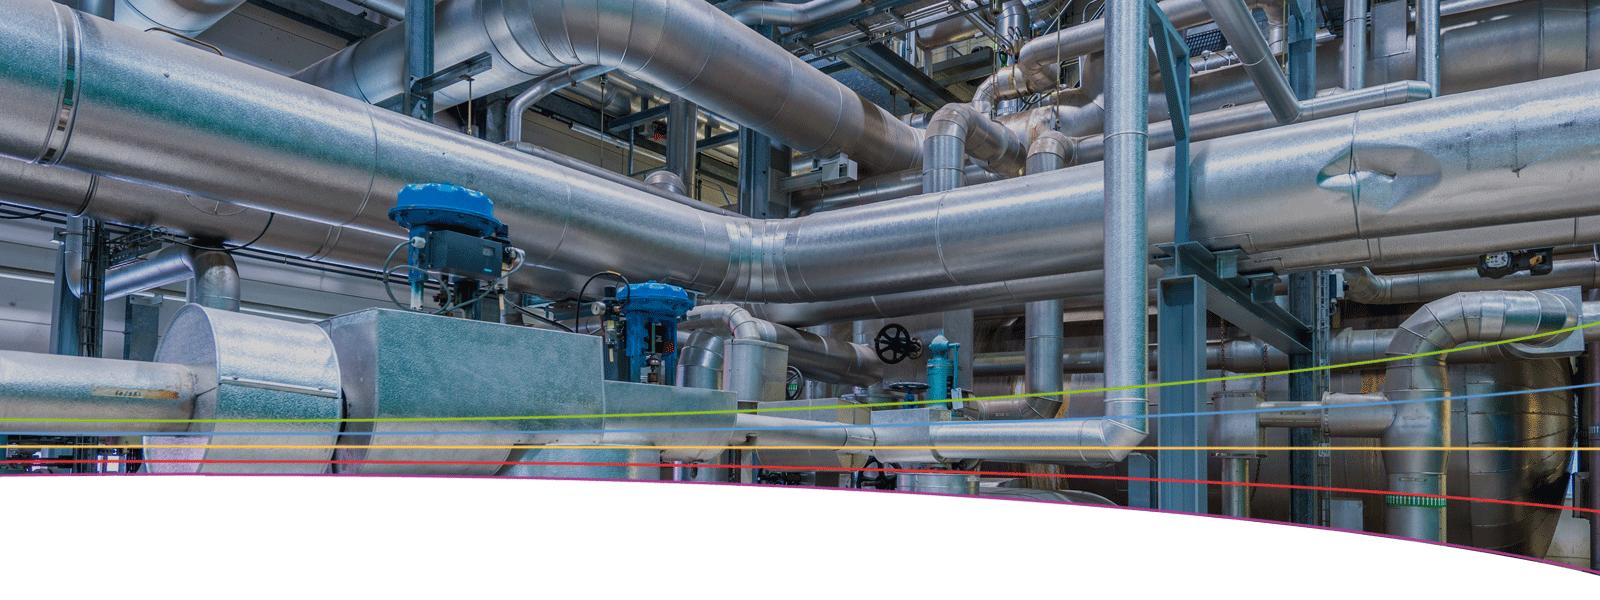 thermal-power-plant-homeheader-linesense